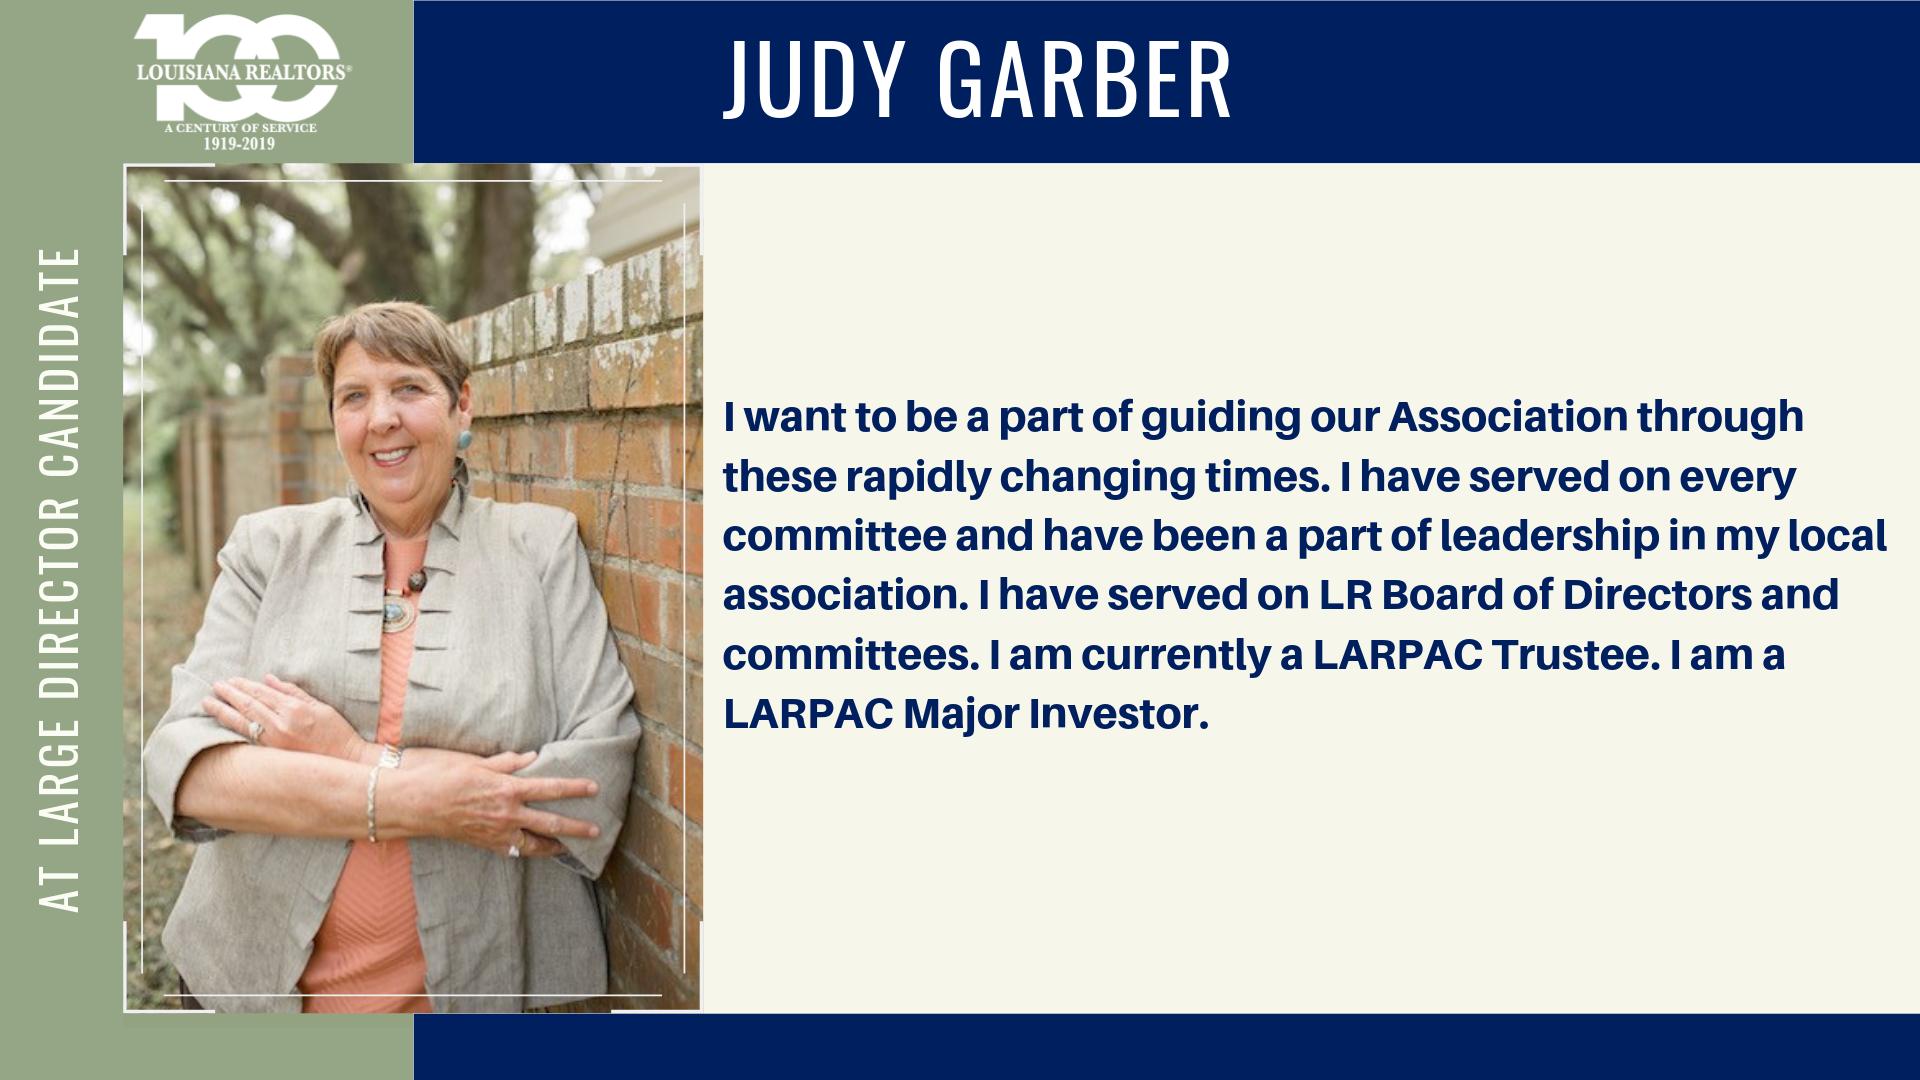 Garber Judy.png